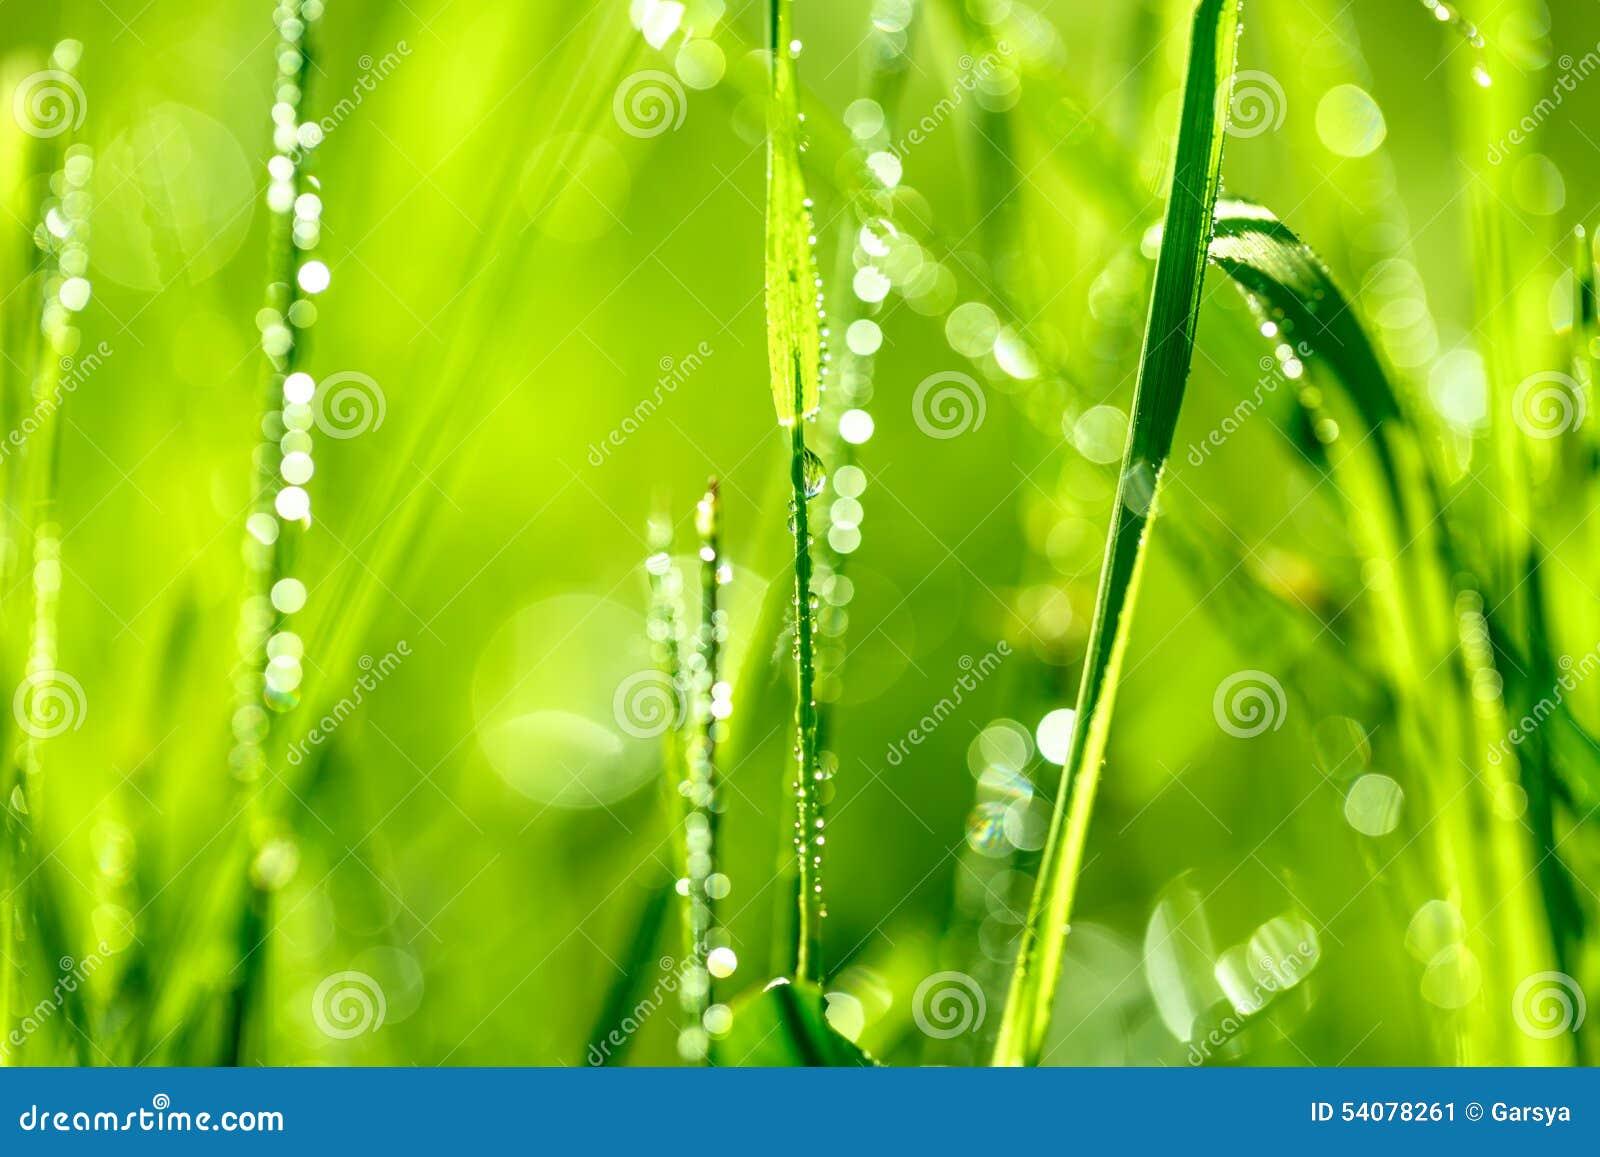 Grassprietje in ochtenddauw